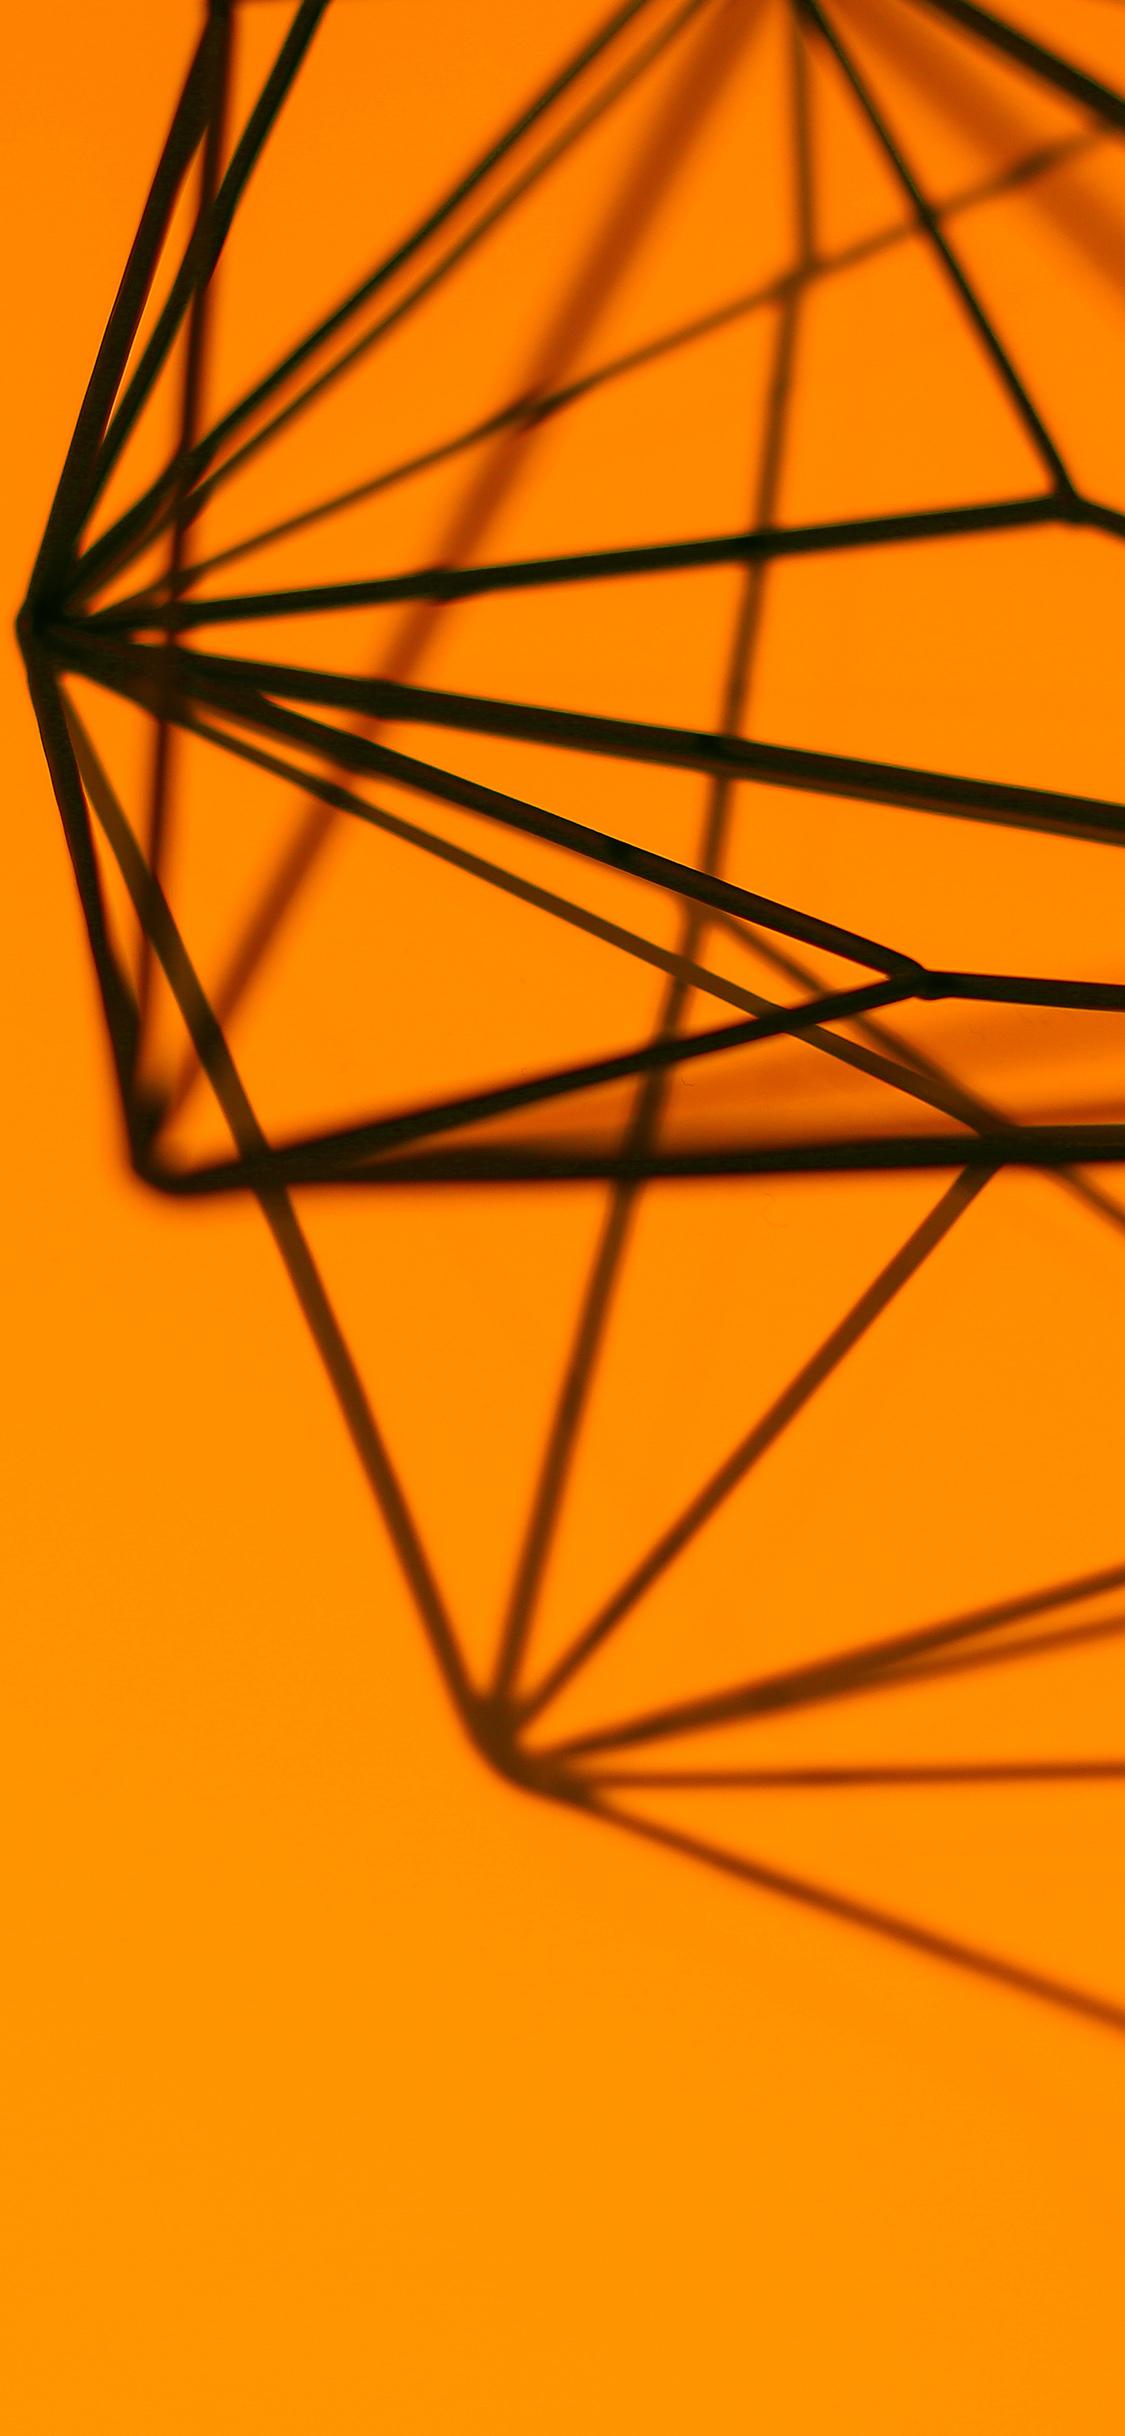 papers.co vk22 simple design deco orange pattern 41 iphone wallpaper